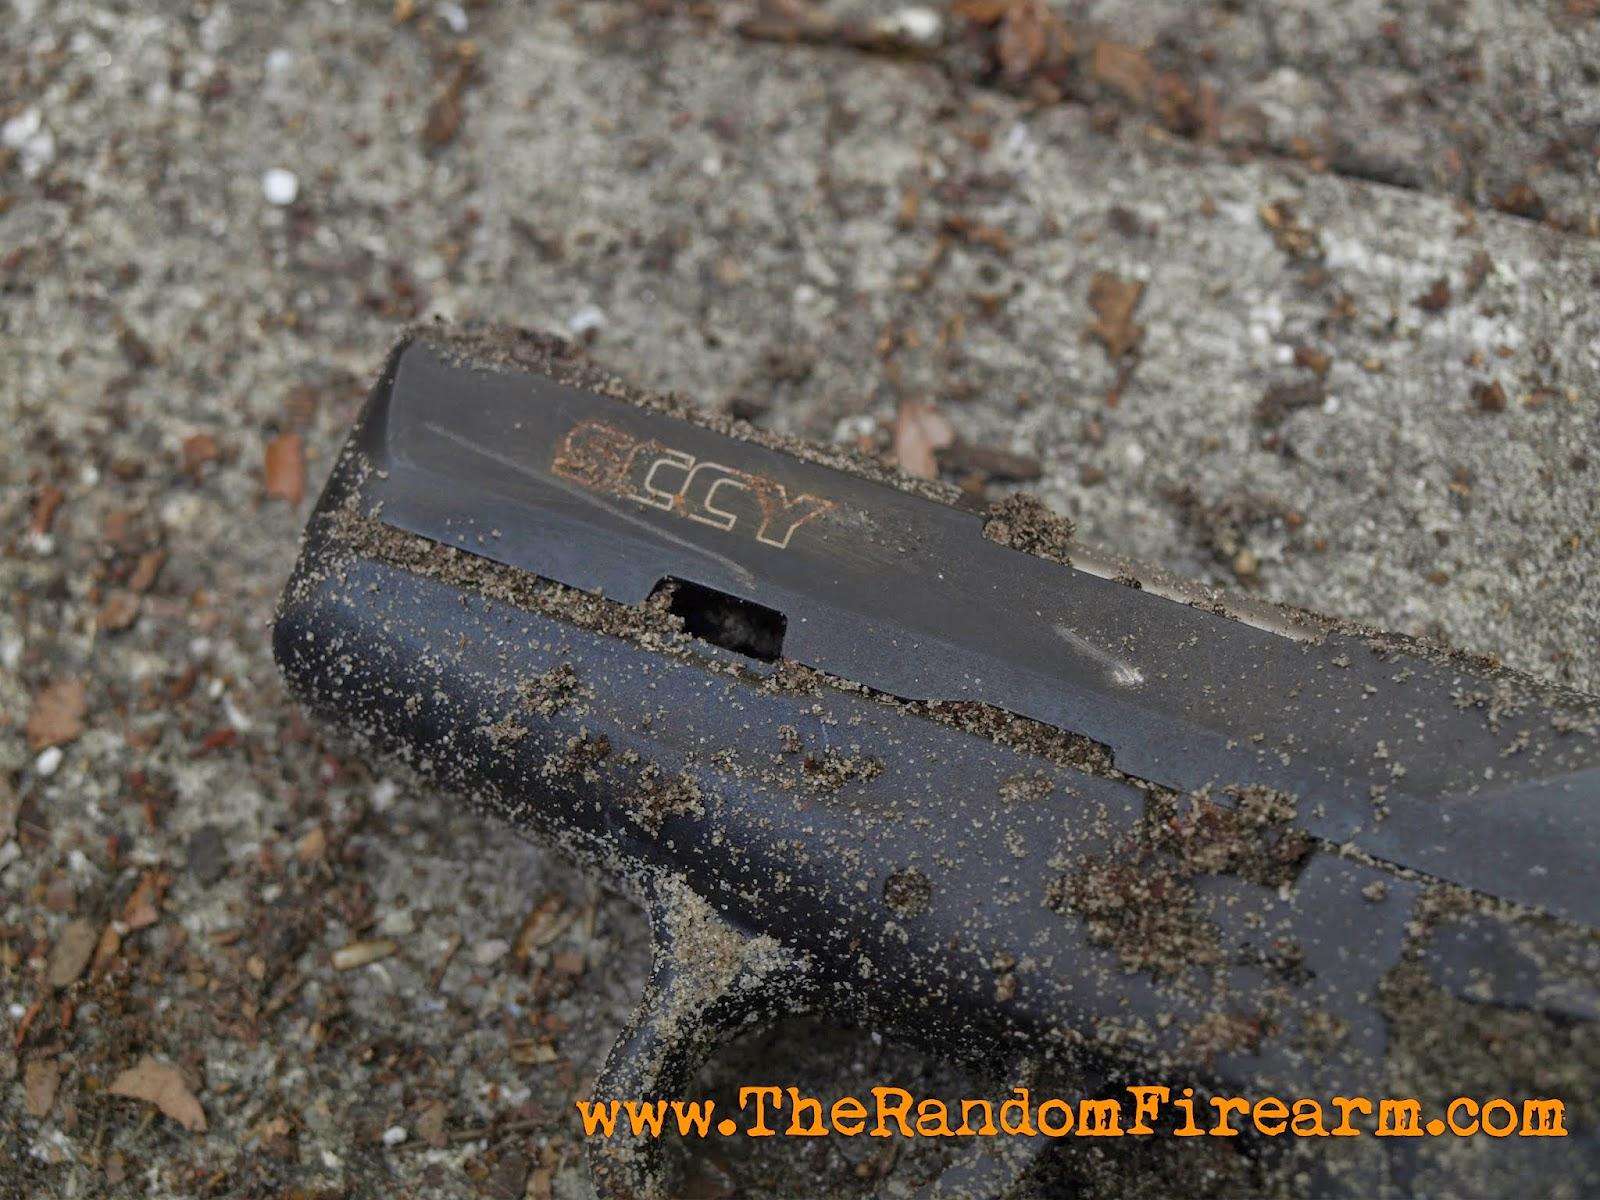 sccy cpx-2 buried torture test cpx2 broken dylan benson random firearm